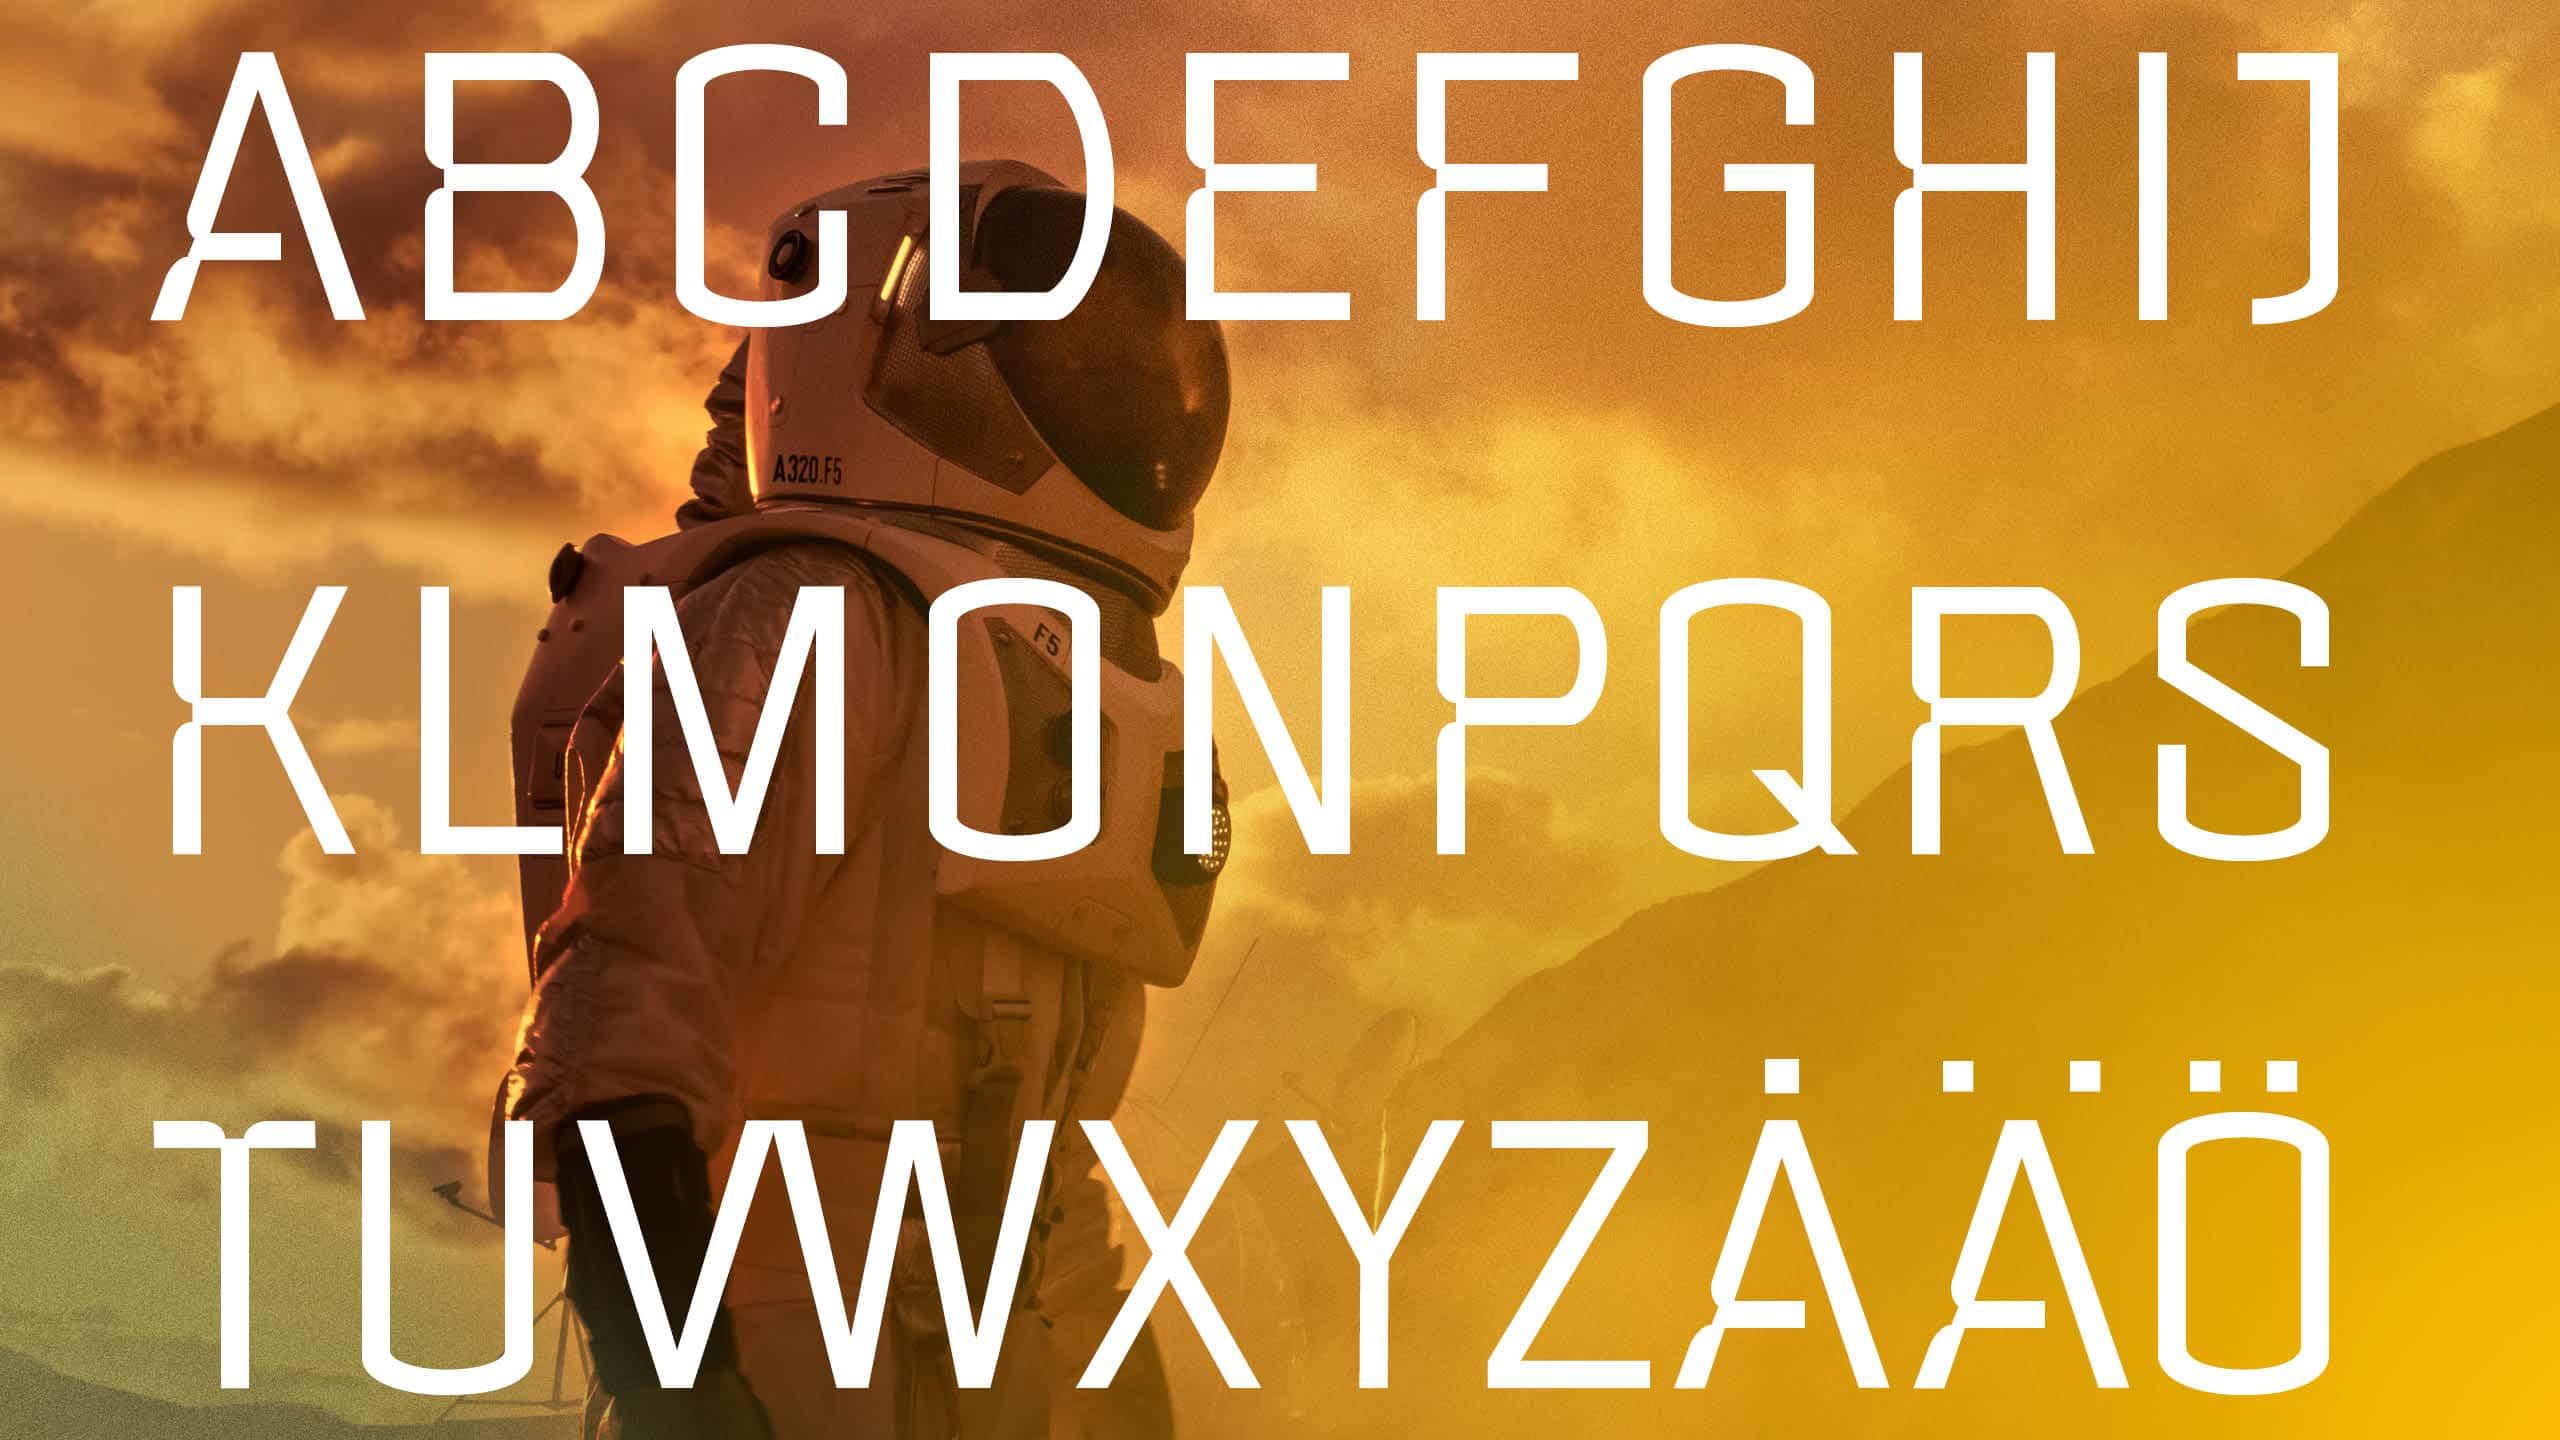 Marketing image for the font Fuglesans, A-Ö.